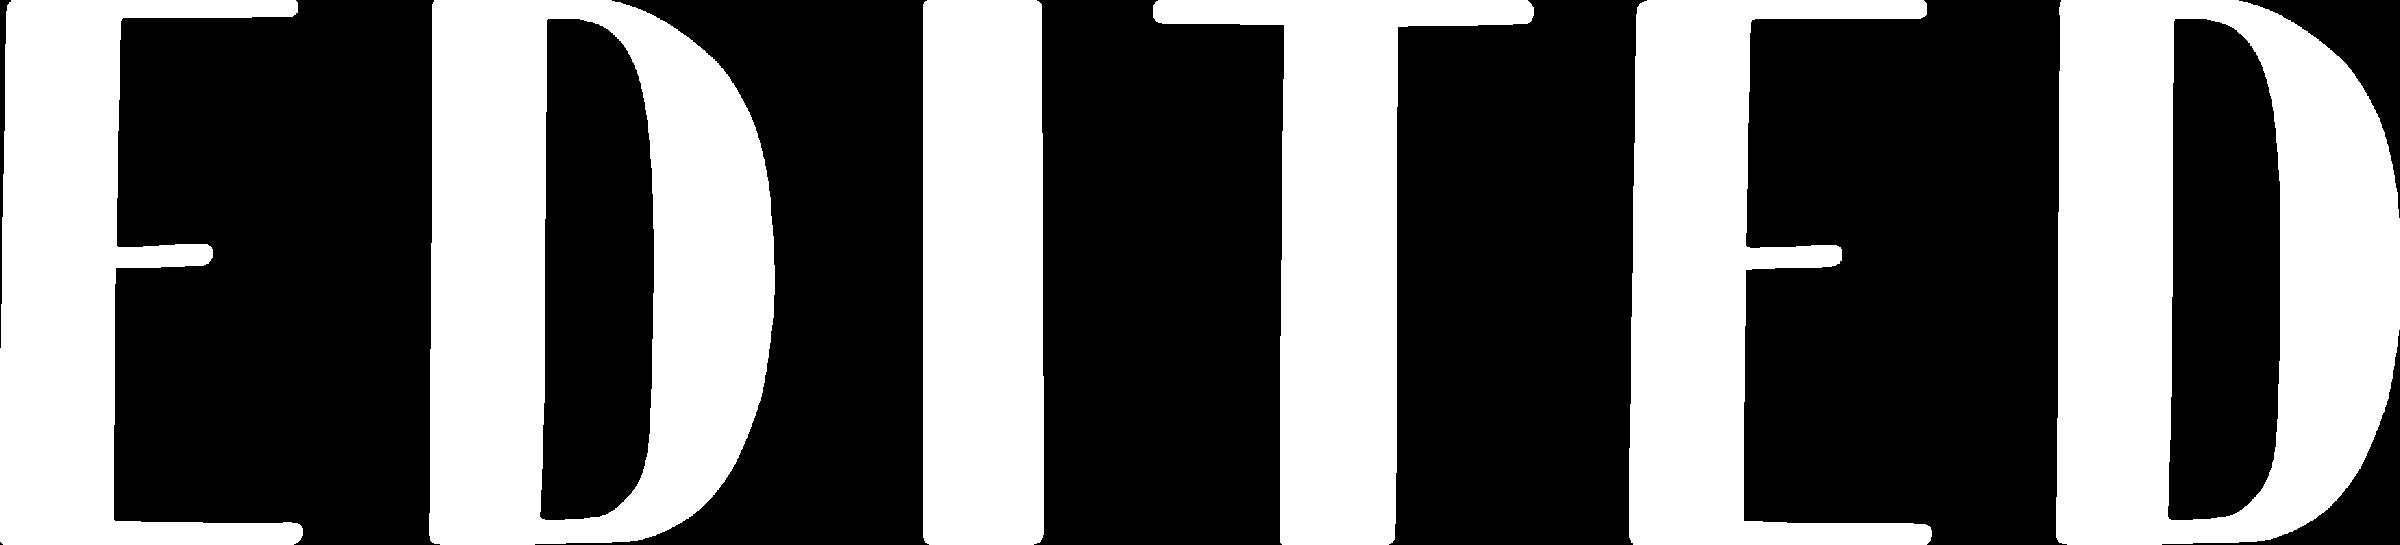 EDITED Logo